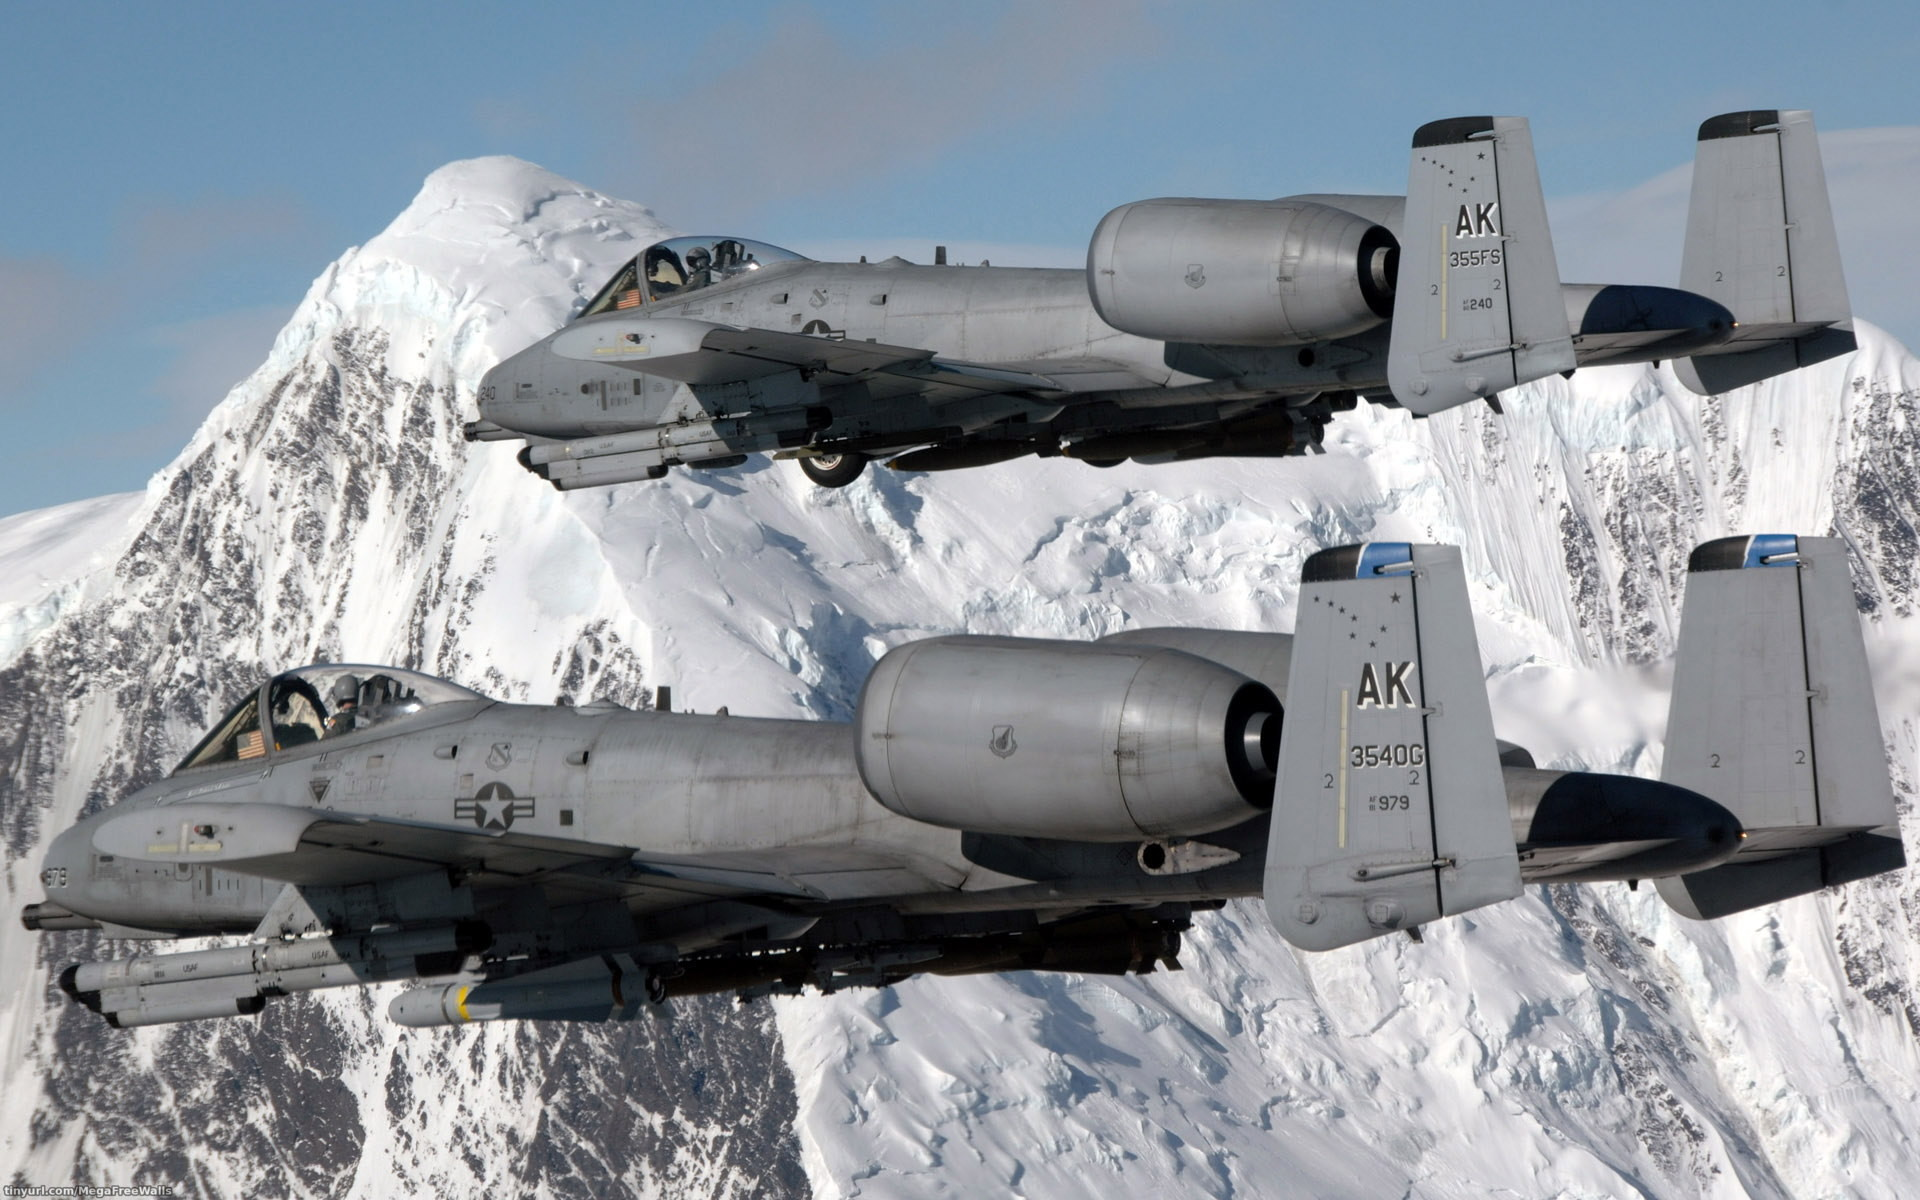 Military – Fairchild Republic A-10 Thunderbolt II Military Airplane Vehicle  Aircraft Wallpaper